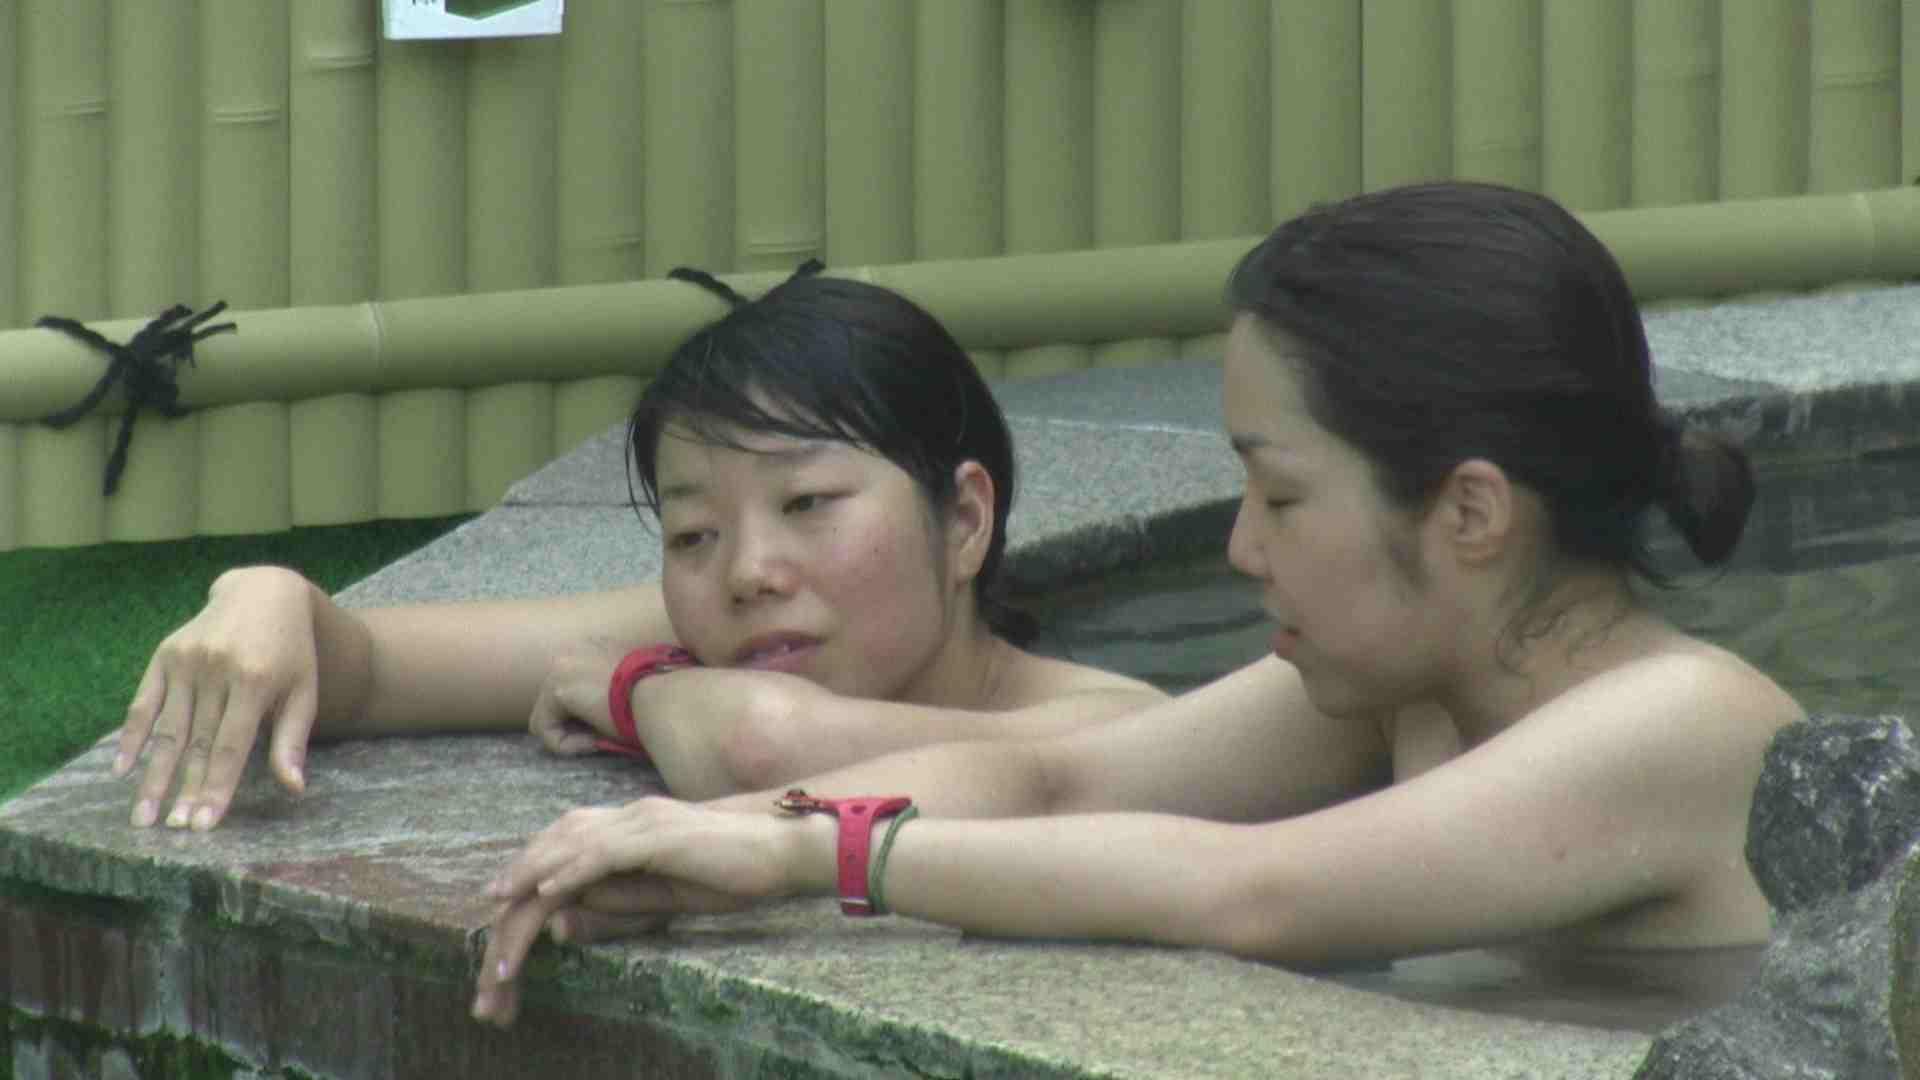 Aquaな露天風呂Vol.182 盗撮 盗み撮り動画キャプチャ 80画像 38